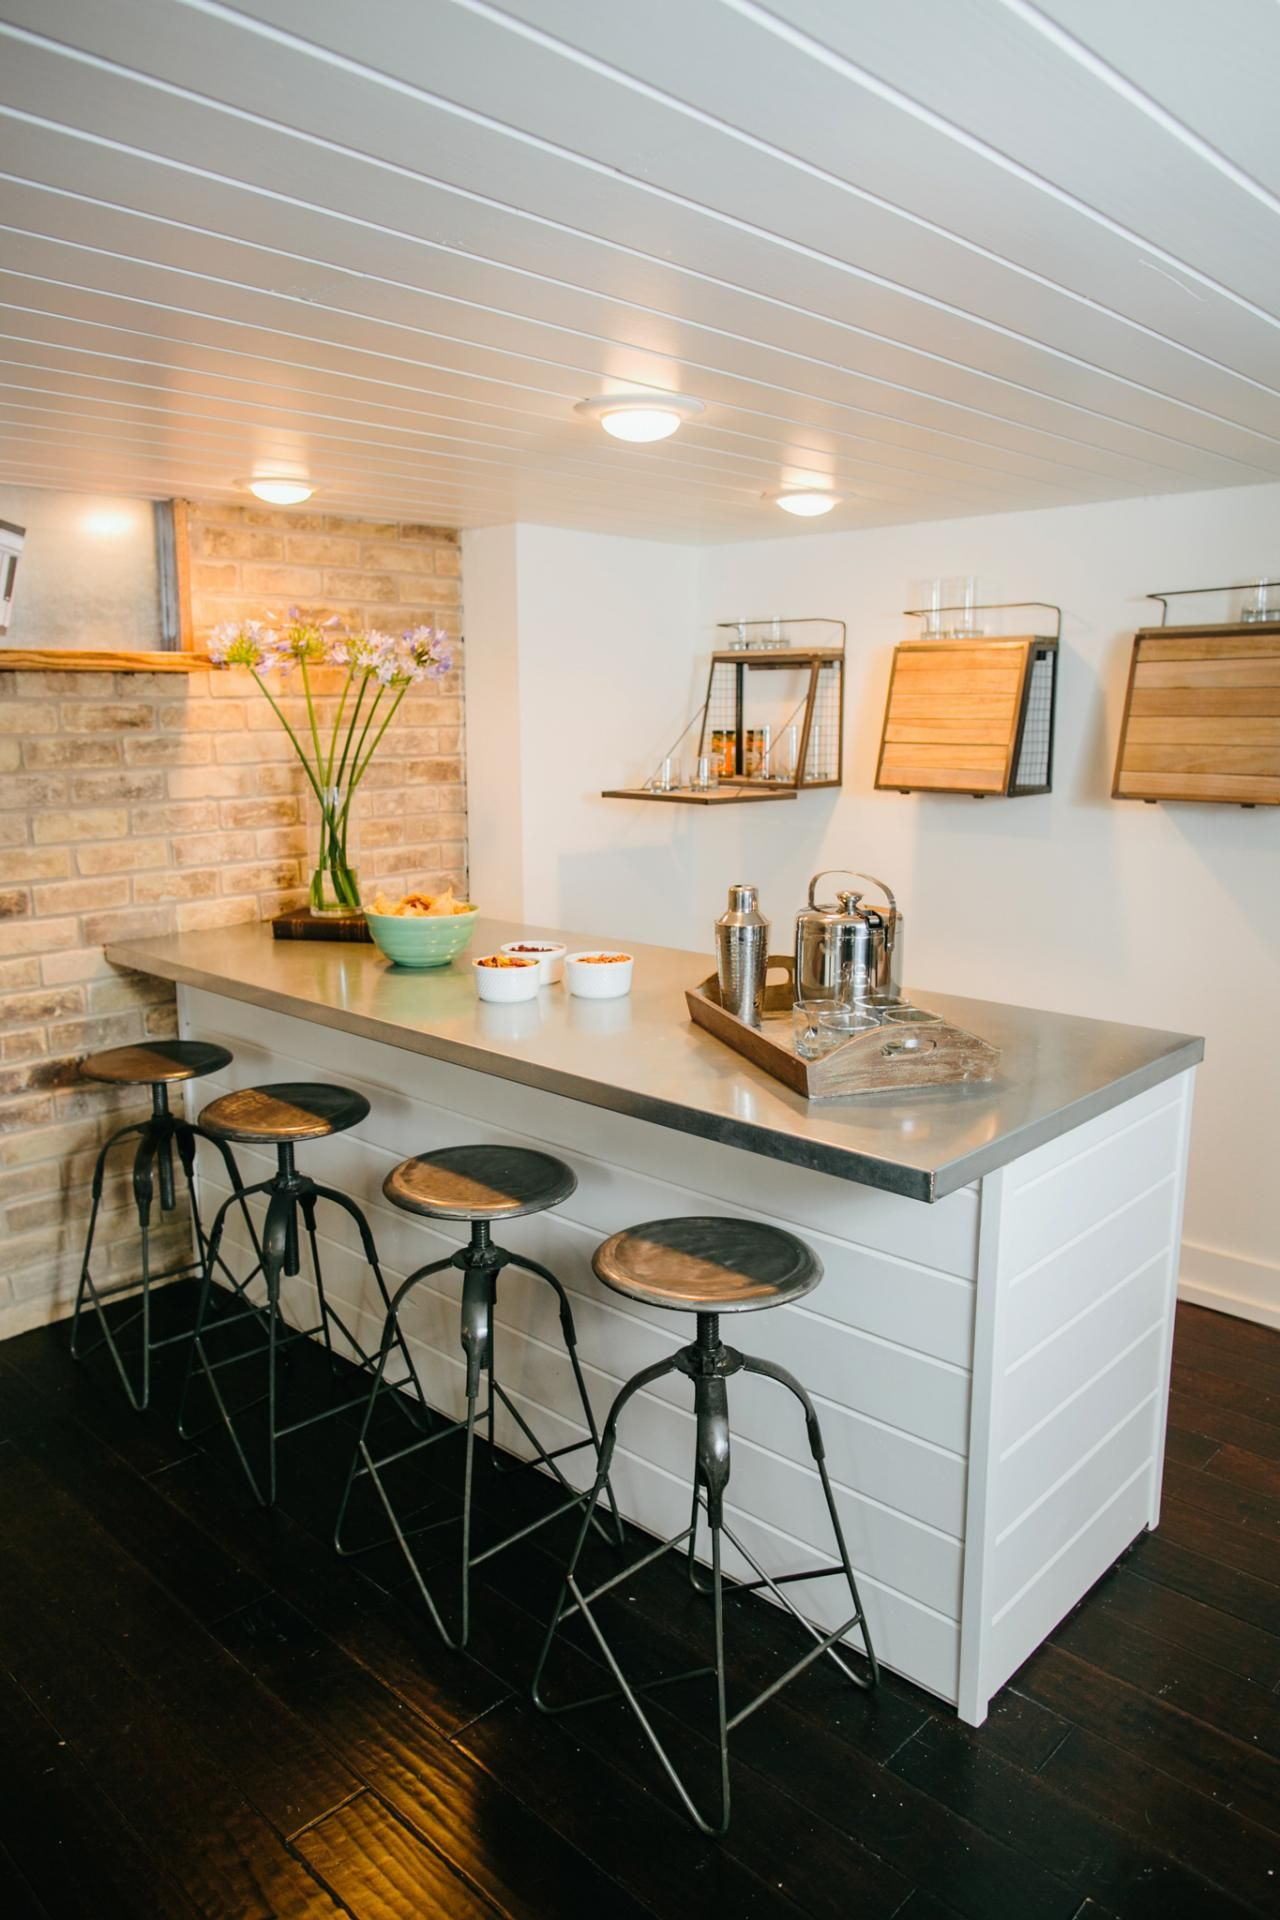 Fixer upper kitchen stools - Fixer Upper Bringing A Modern Coastal Look To A Faceless Bunker Hgtv